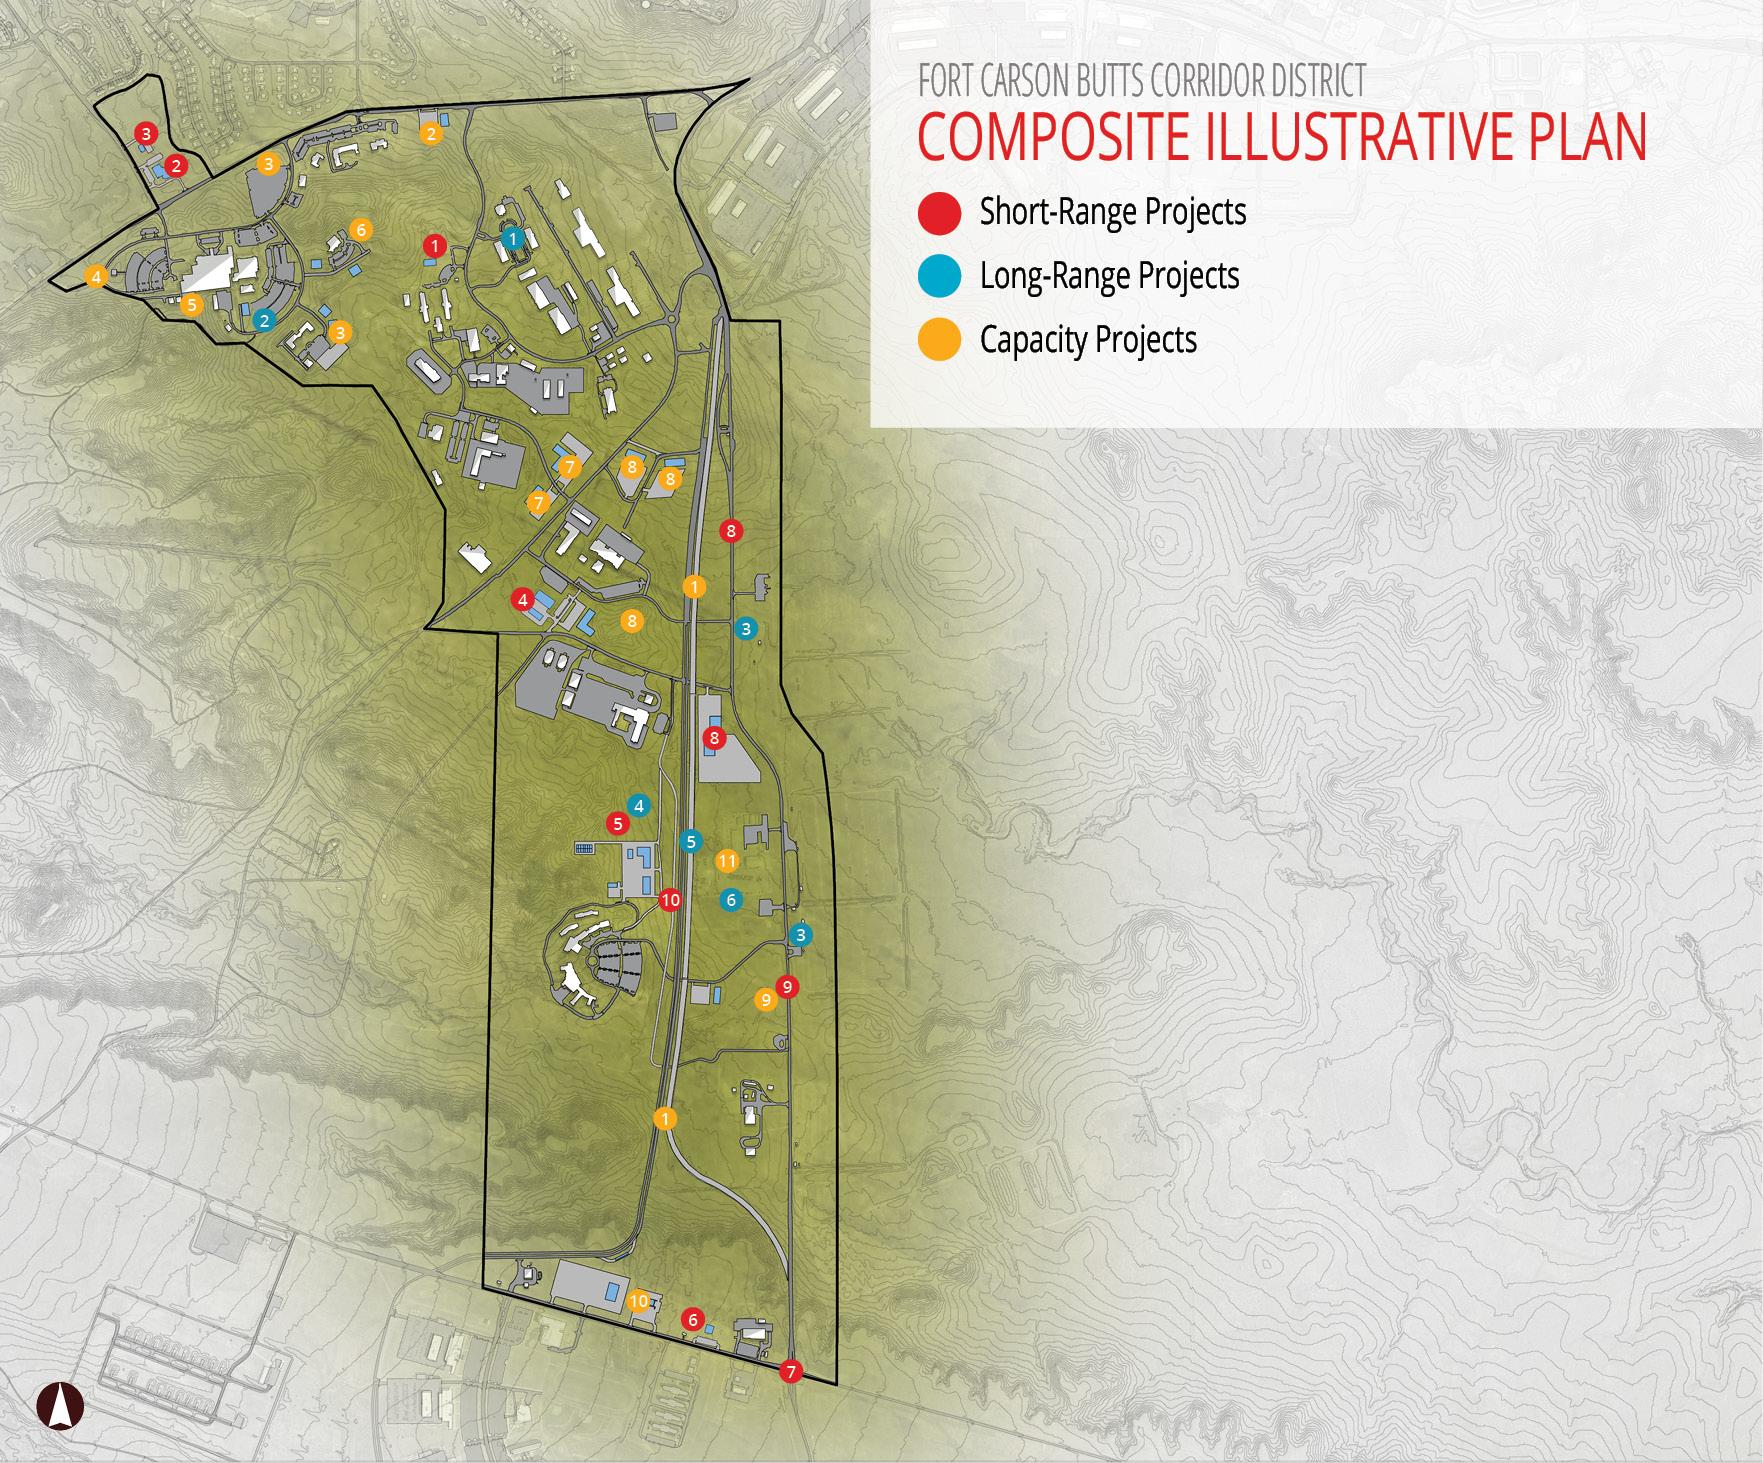 Composite Illustrative Plans4.jpg